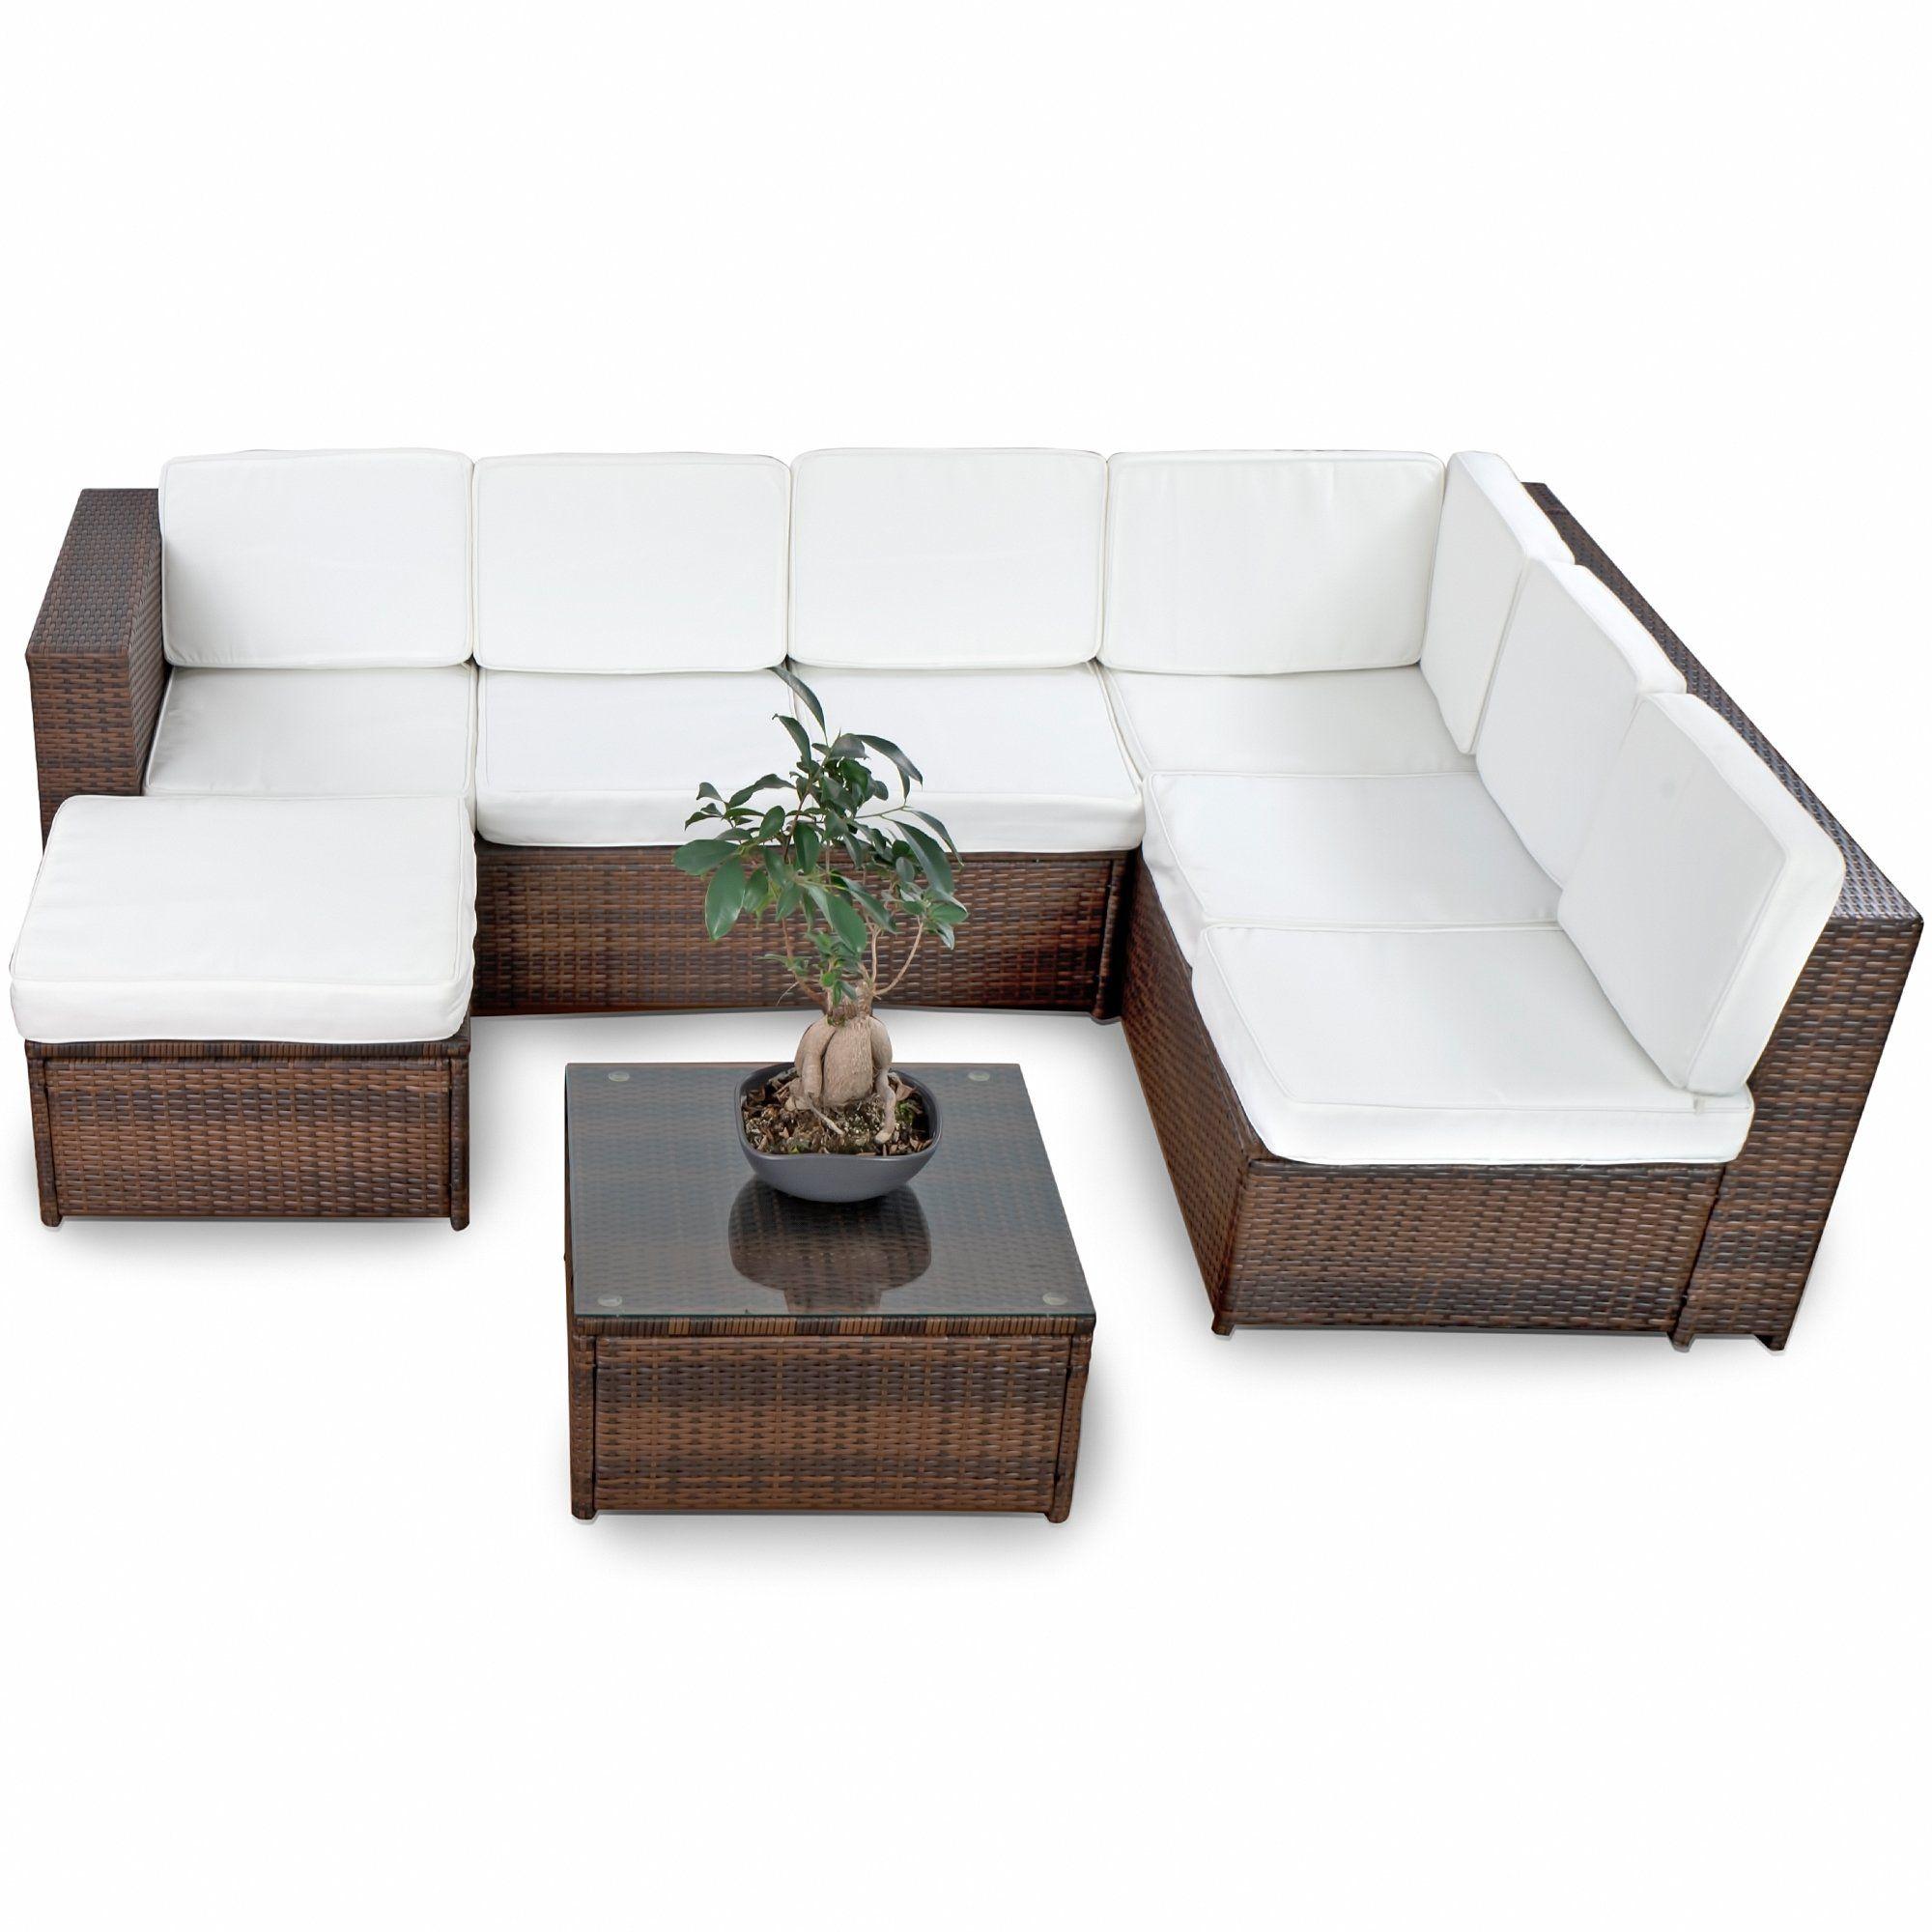 Polyrattan Gartenmöbel Braun Günstig Angebote Rattan Gartenmöbel